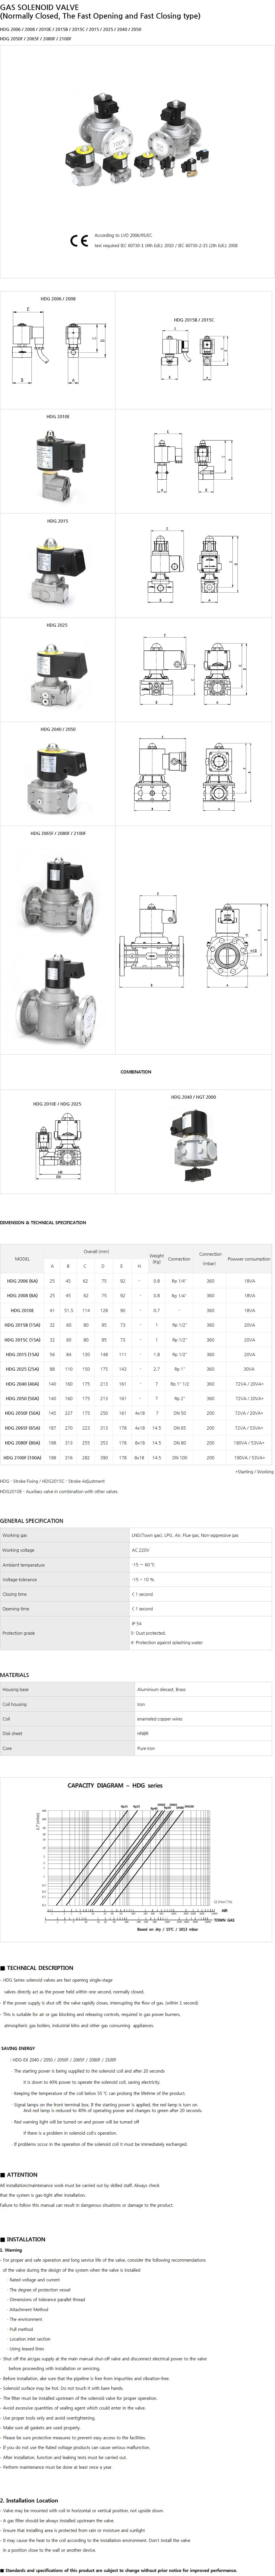 HYOSHIN MECHATRONICS Gas Solenoid Valve (N.C.)  1